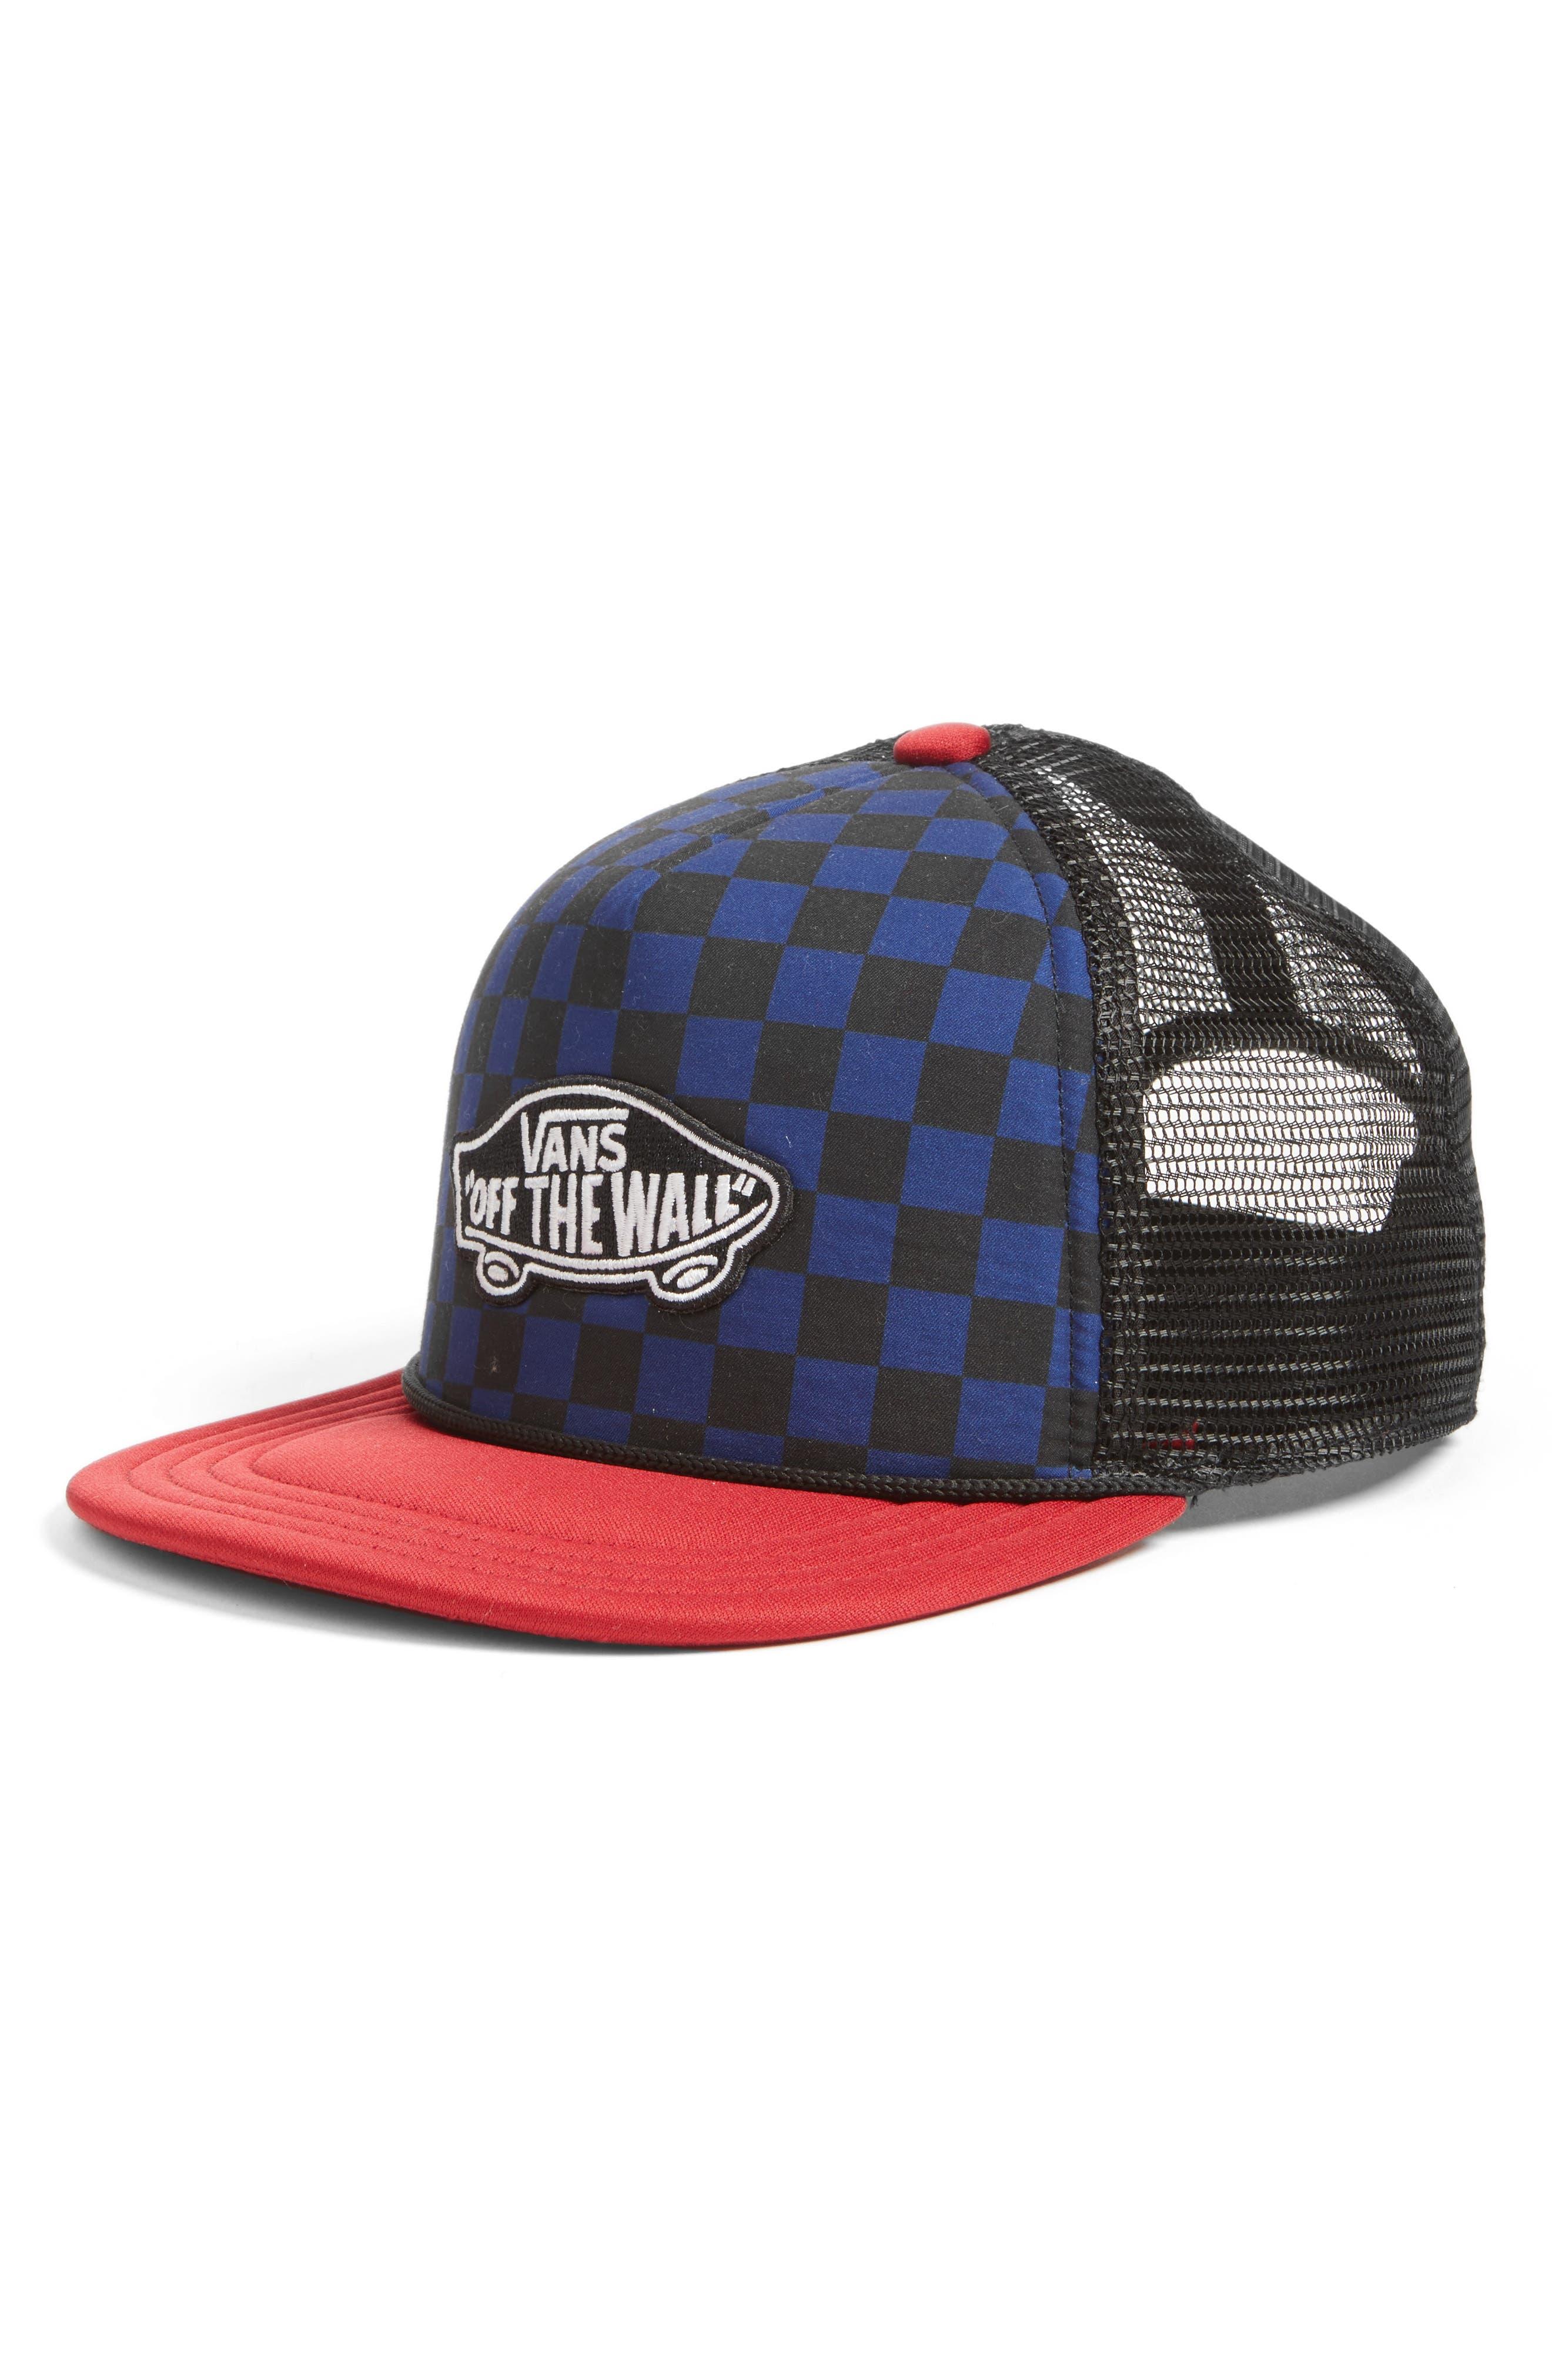 Vans Classic Patch Trucker Hat (Big Boys)